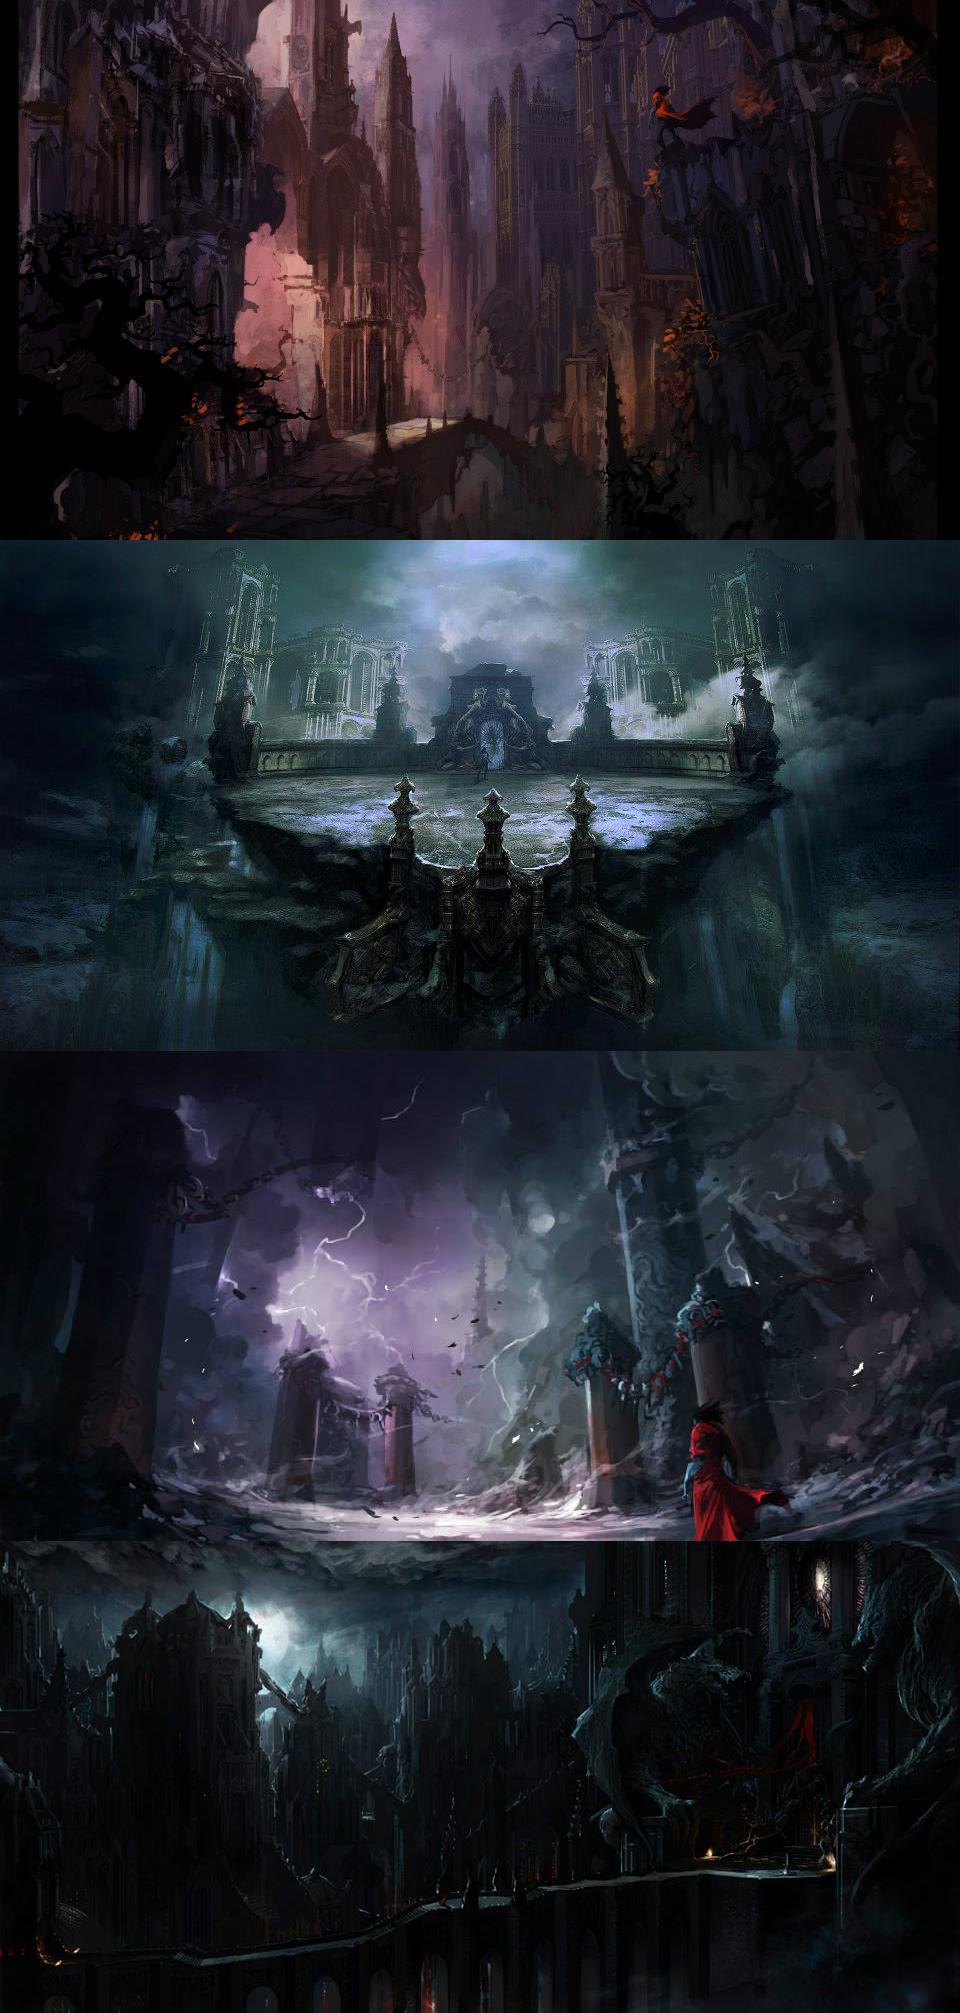 Tajemně krásné artworky z Castlevania: Lords of Shadow 2 86791